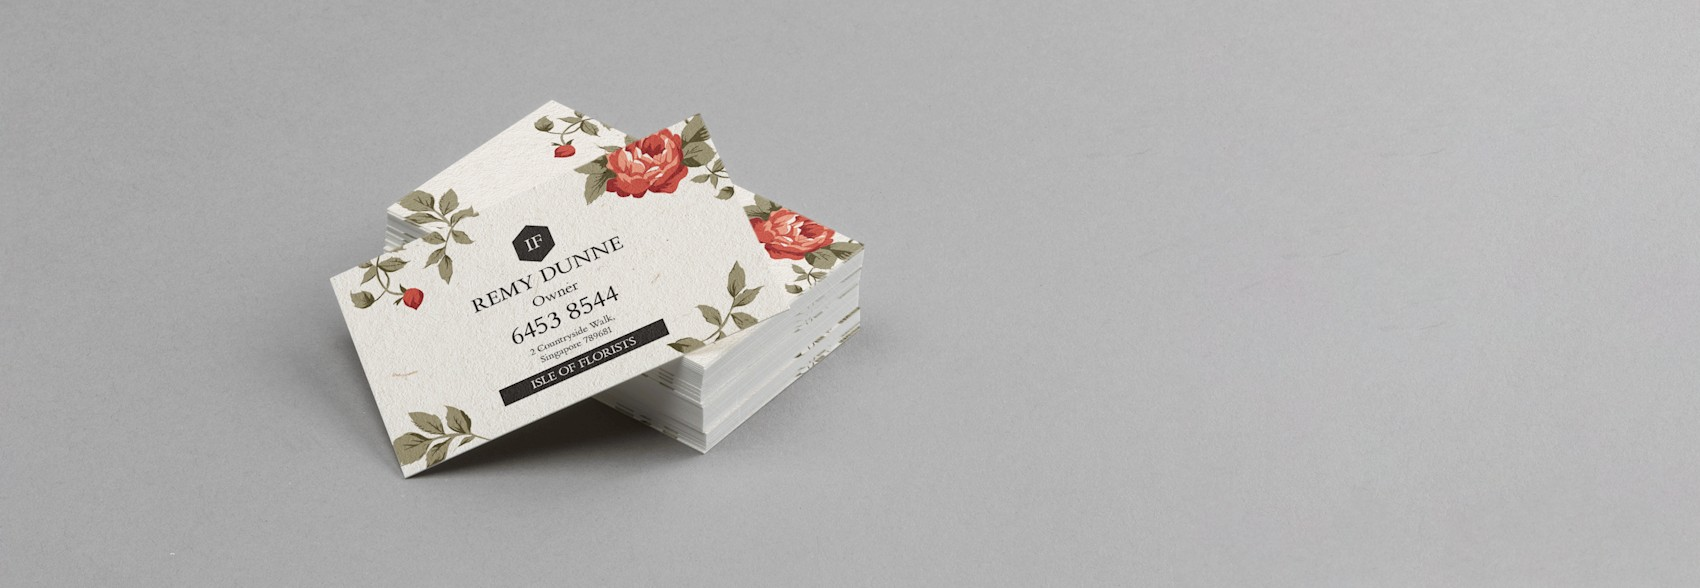 Cotton cards